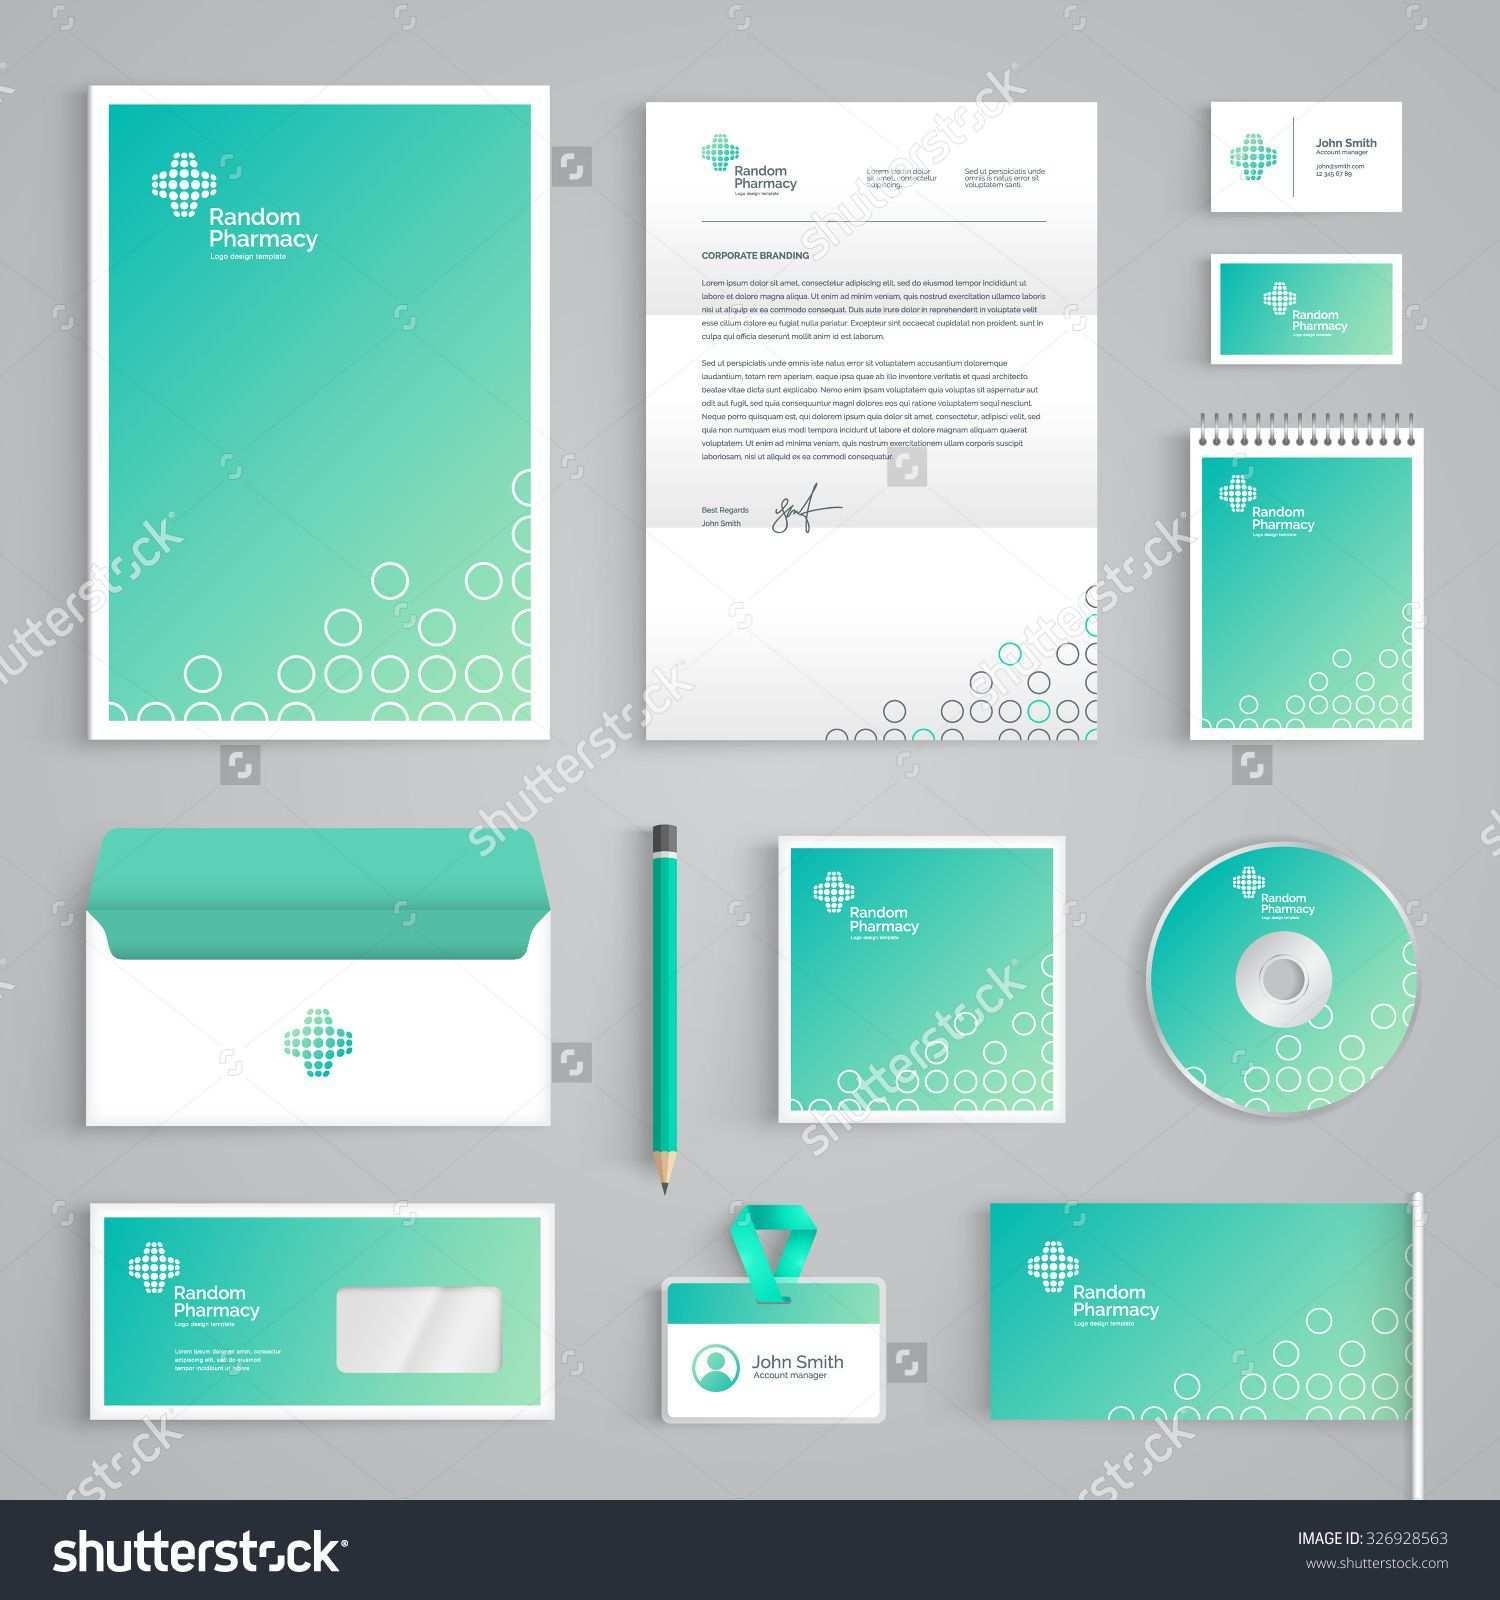 502 Bad Gateway Corporate Identity Design Briefpapier Design Branding Design